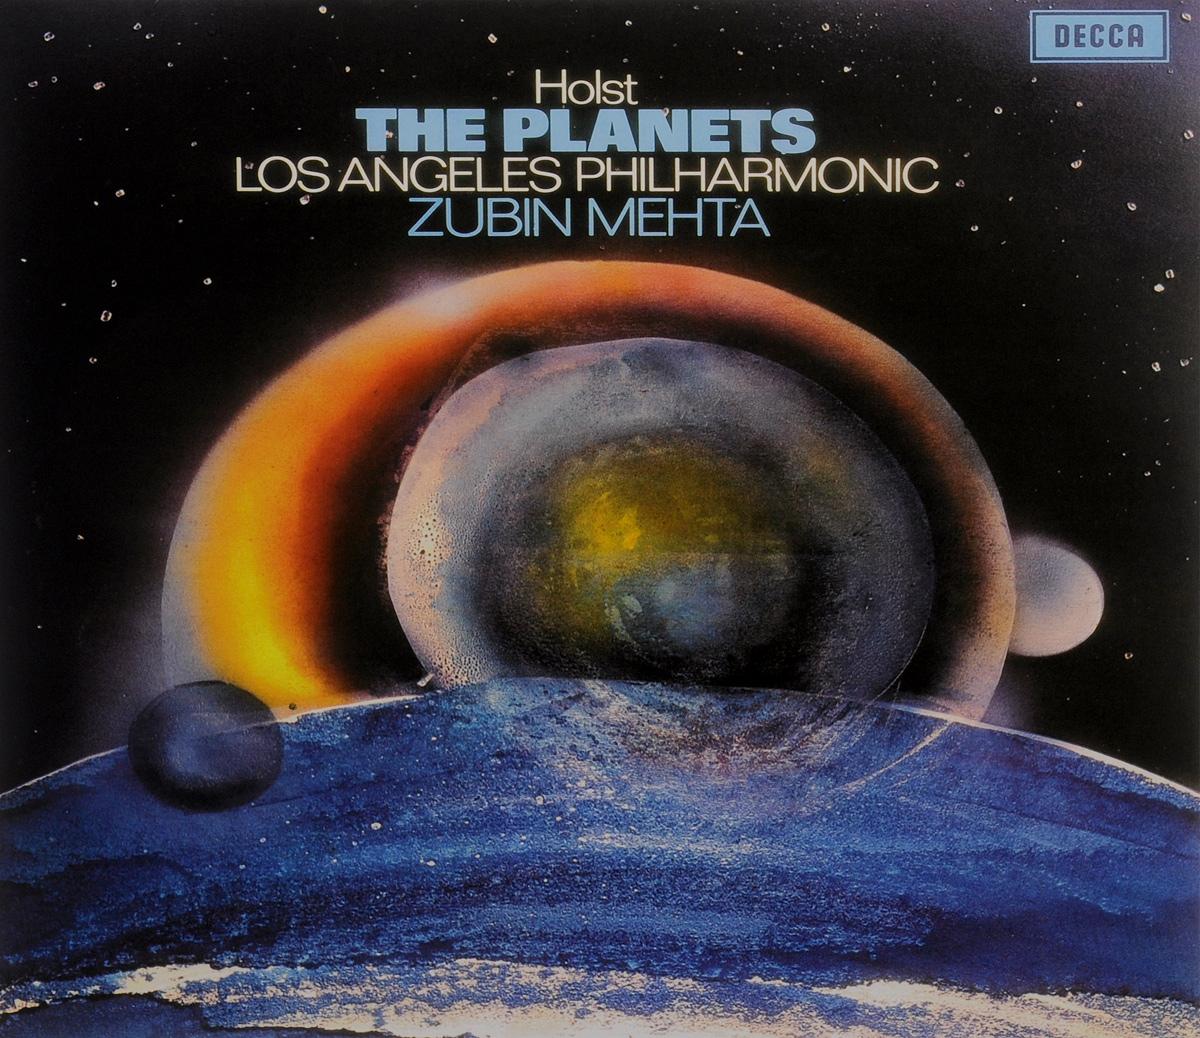 Los Angeles Philharmonic Orchestra Gustav Holst, Los Angeles Philharmonic Orchestra, Zubin Mehta. The Planets (LP) los angeles times sunday crossword omnibus volume 7